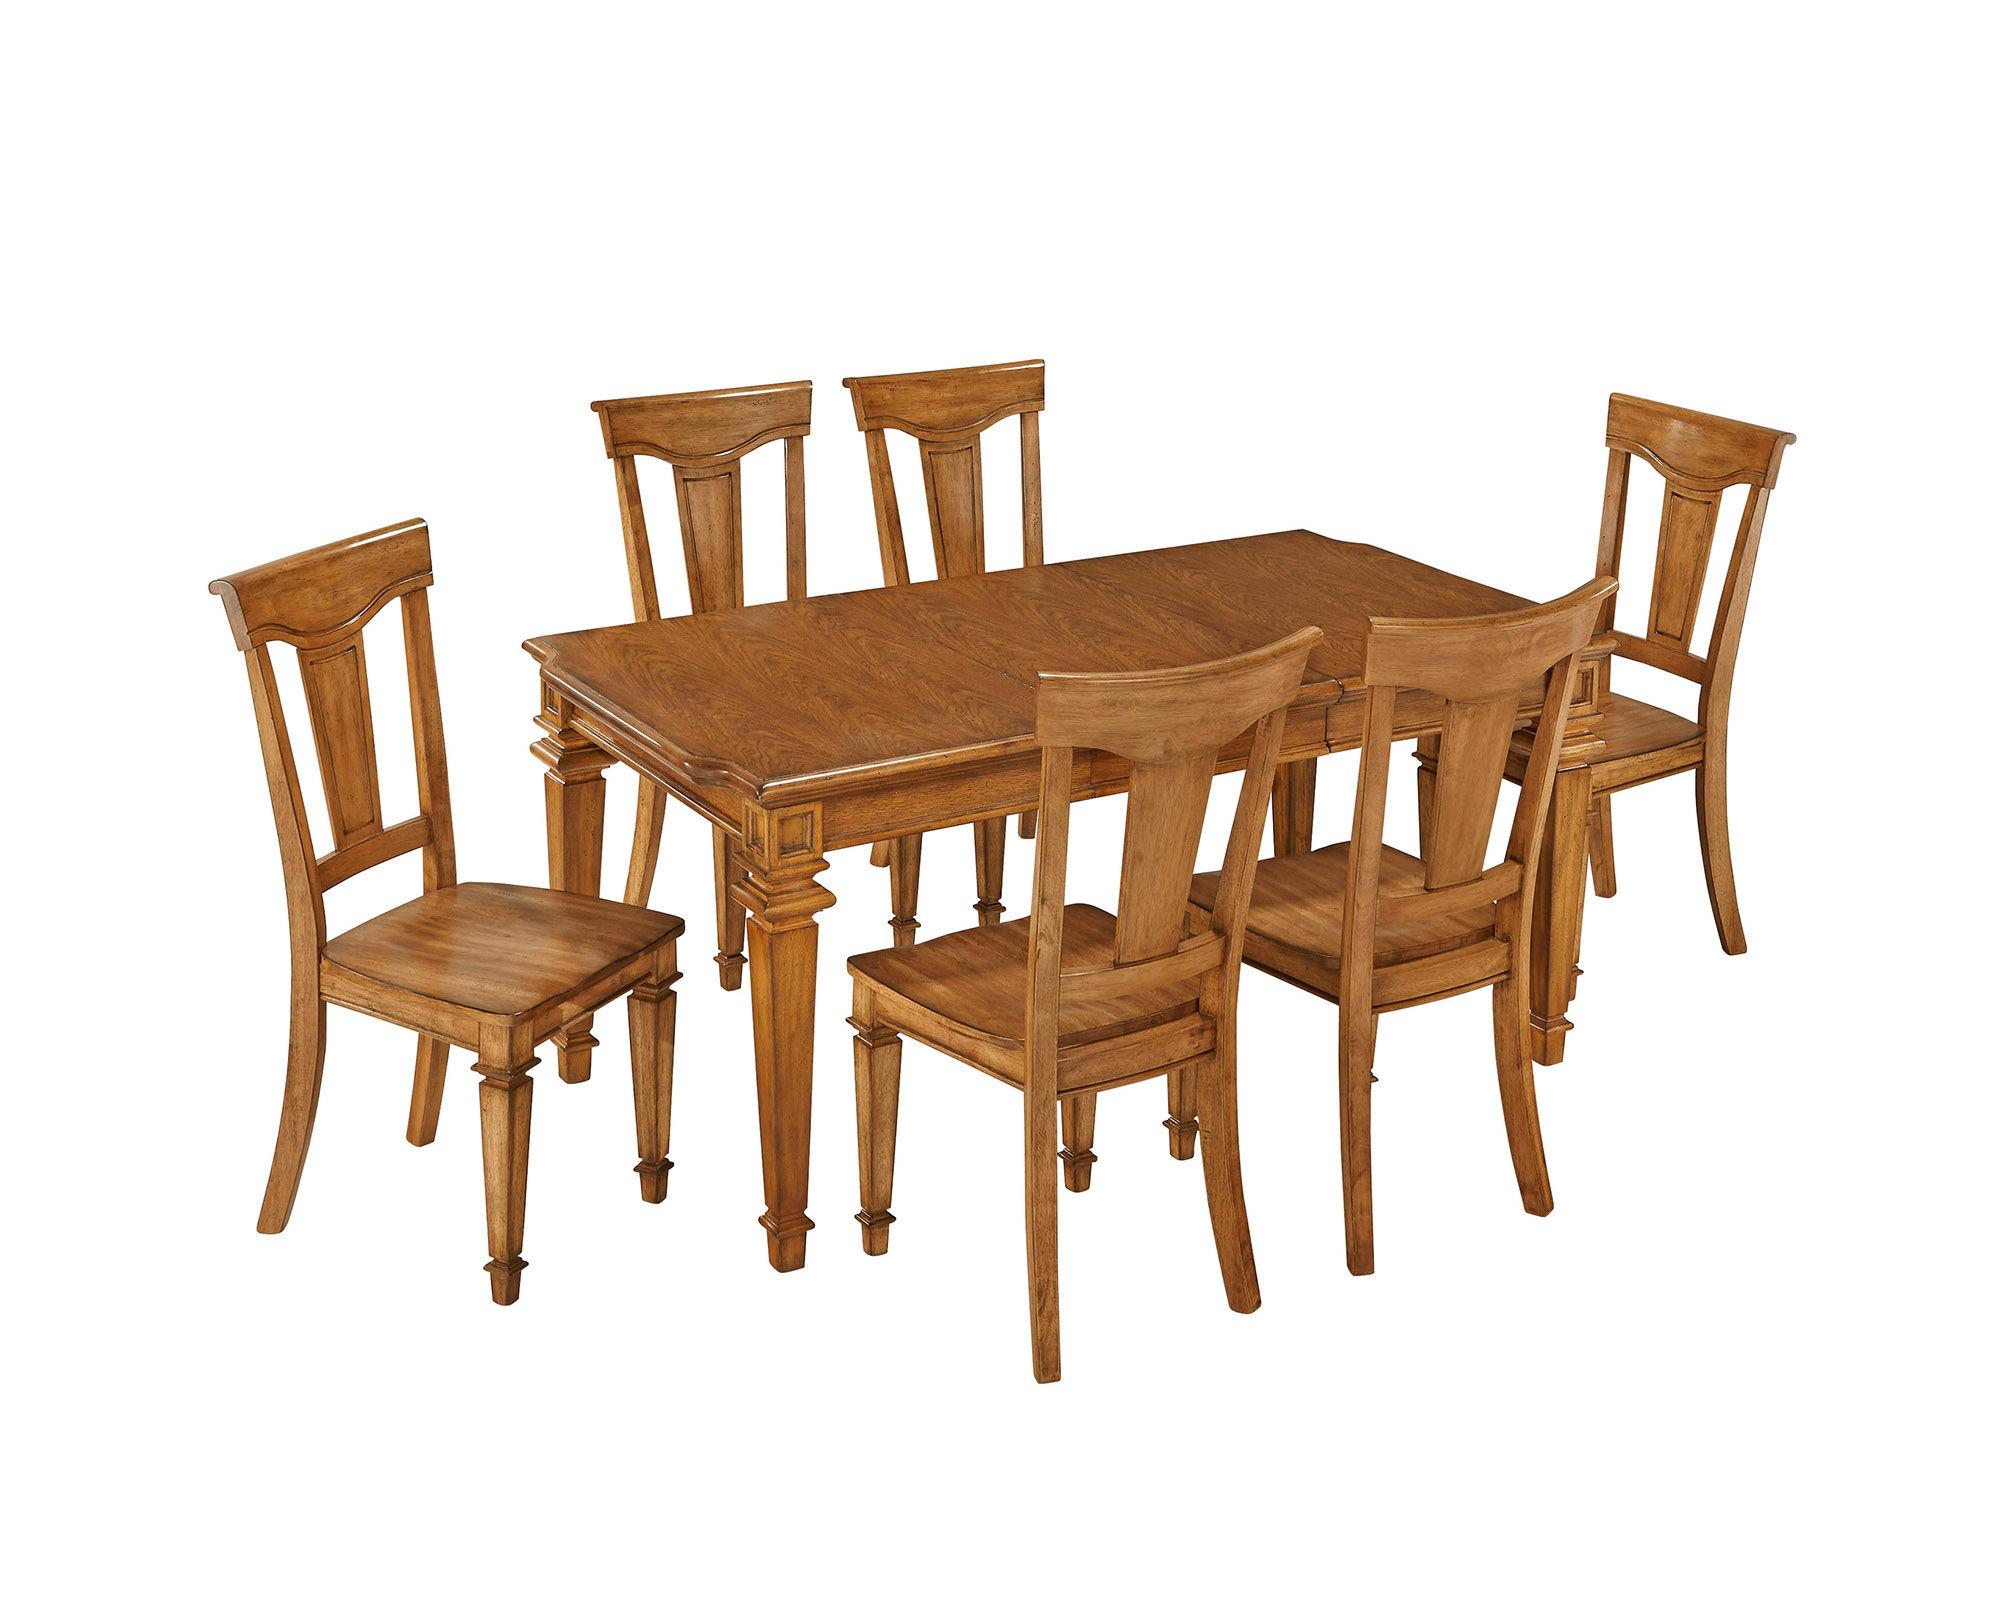 Meadowbrook 5 pc Round Dining Set 79611490018 : DP0319201517022662Mwid2000amphei2000ampopsharpen1 from pricecheckpro.com size 2000 x 2000 jpeg 316kB